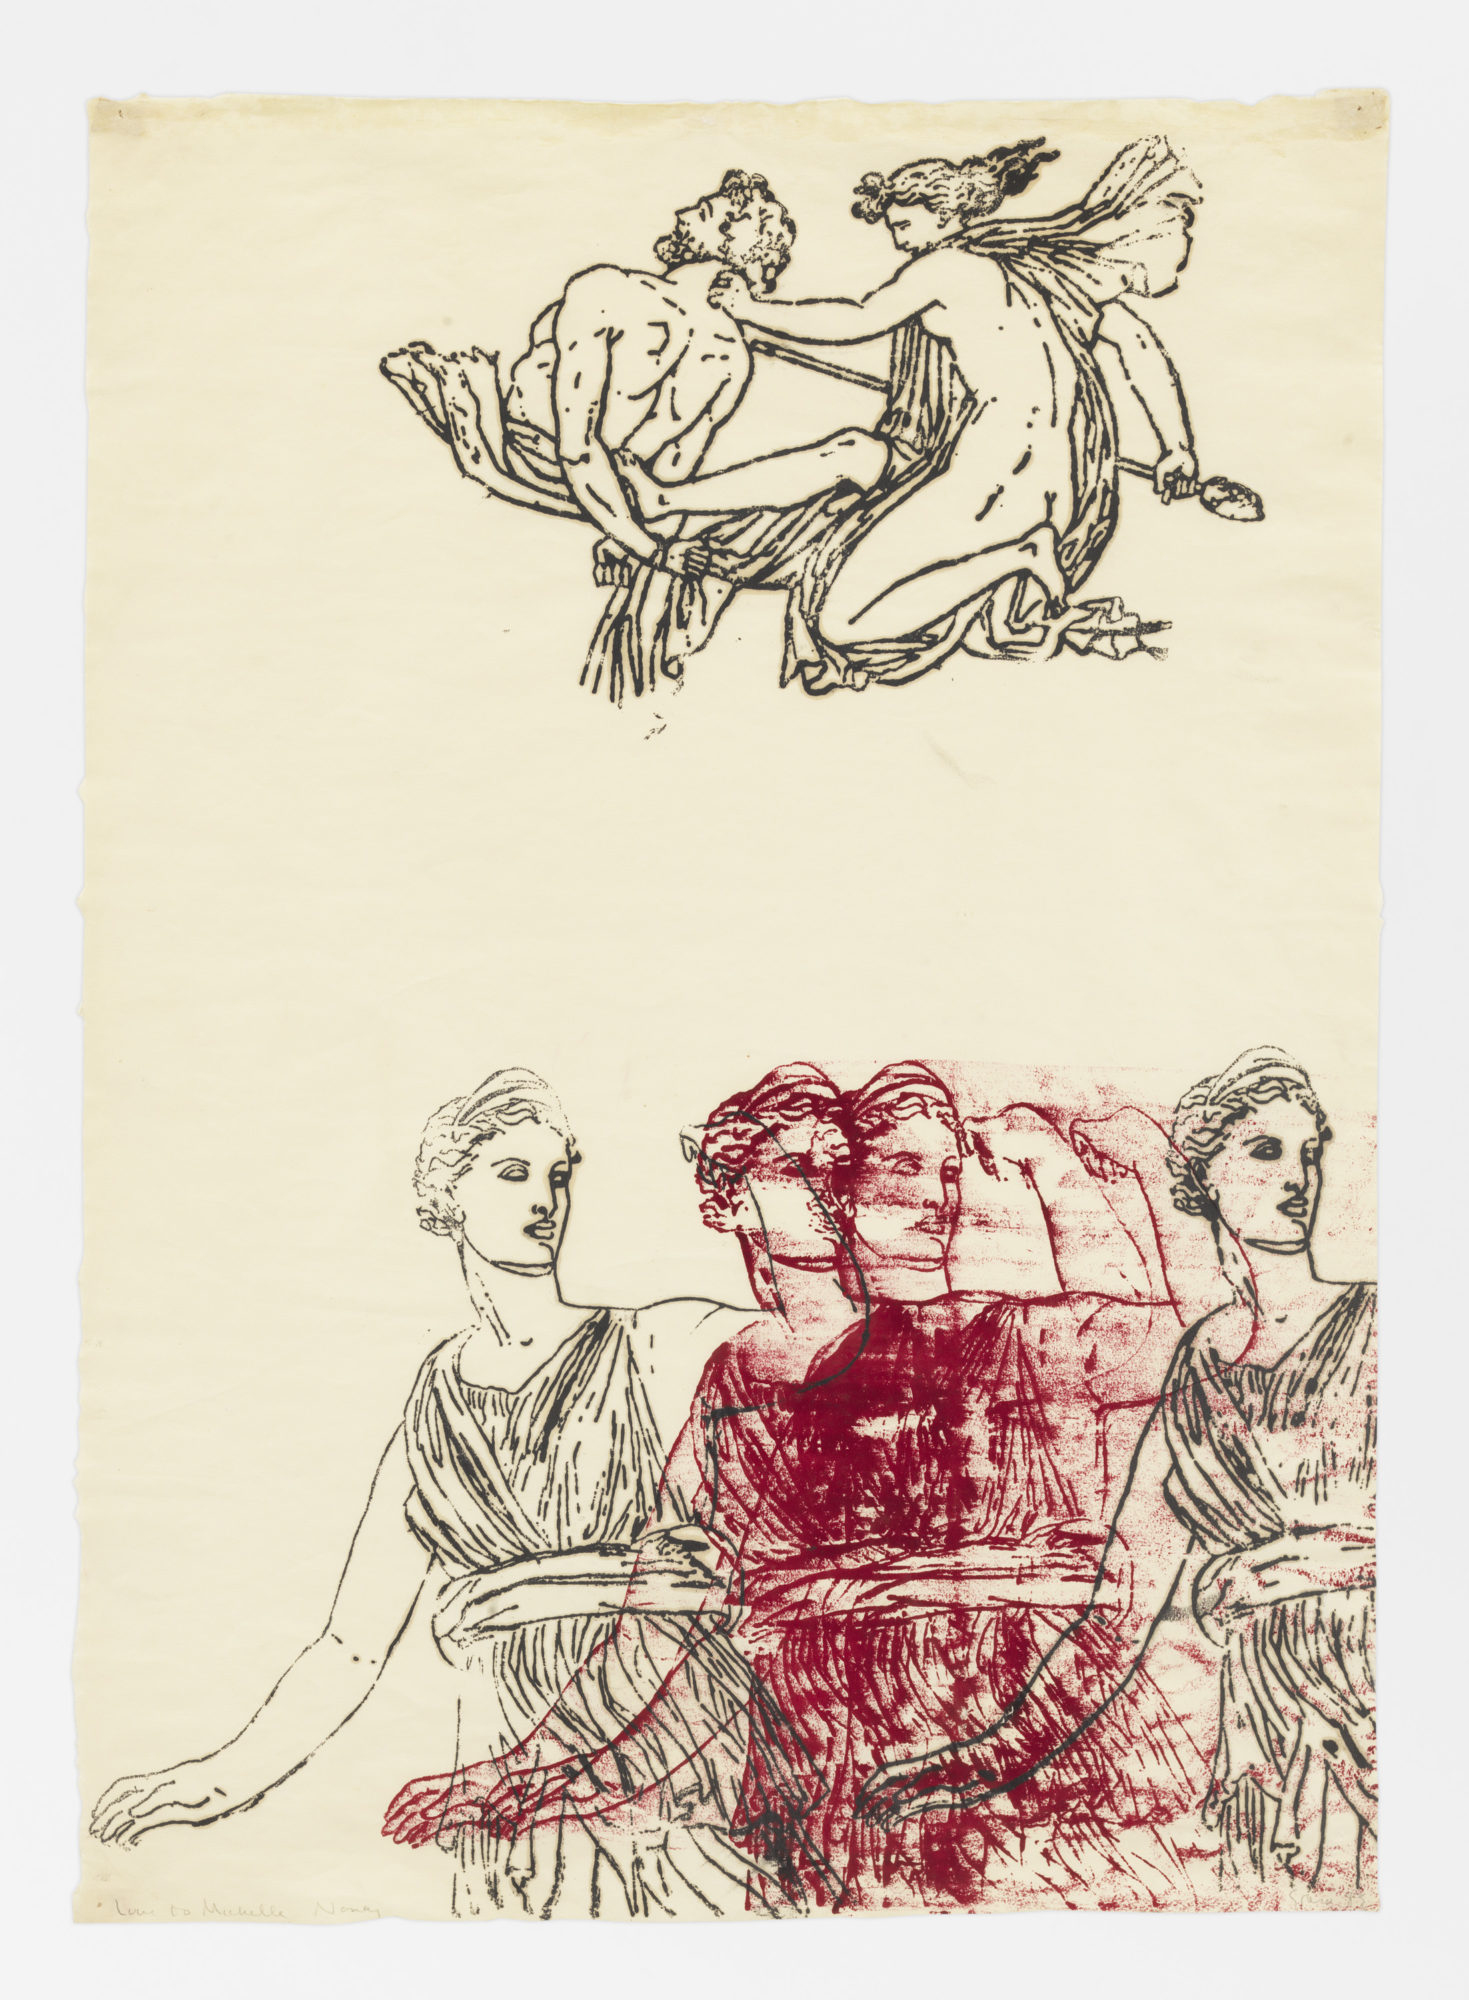 Nancy Spero. Artemis, Goddess and Centaur. 1983. Handprinting on paper . 71.1 x 50.8 cm (28 x 20 inches). © 2019 The Nancy Spero and Leon Golub Foundation for the Arts/Licensed by VAGA at ARS, NY, courtesy Galerie Lelong & Co. Photo: Christopher Burke Studio